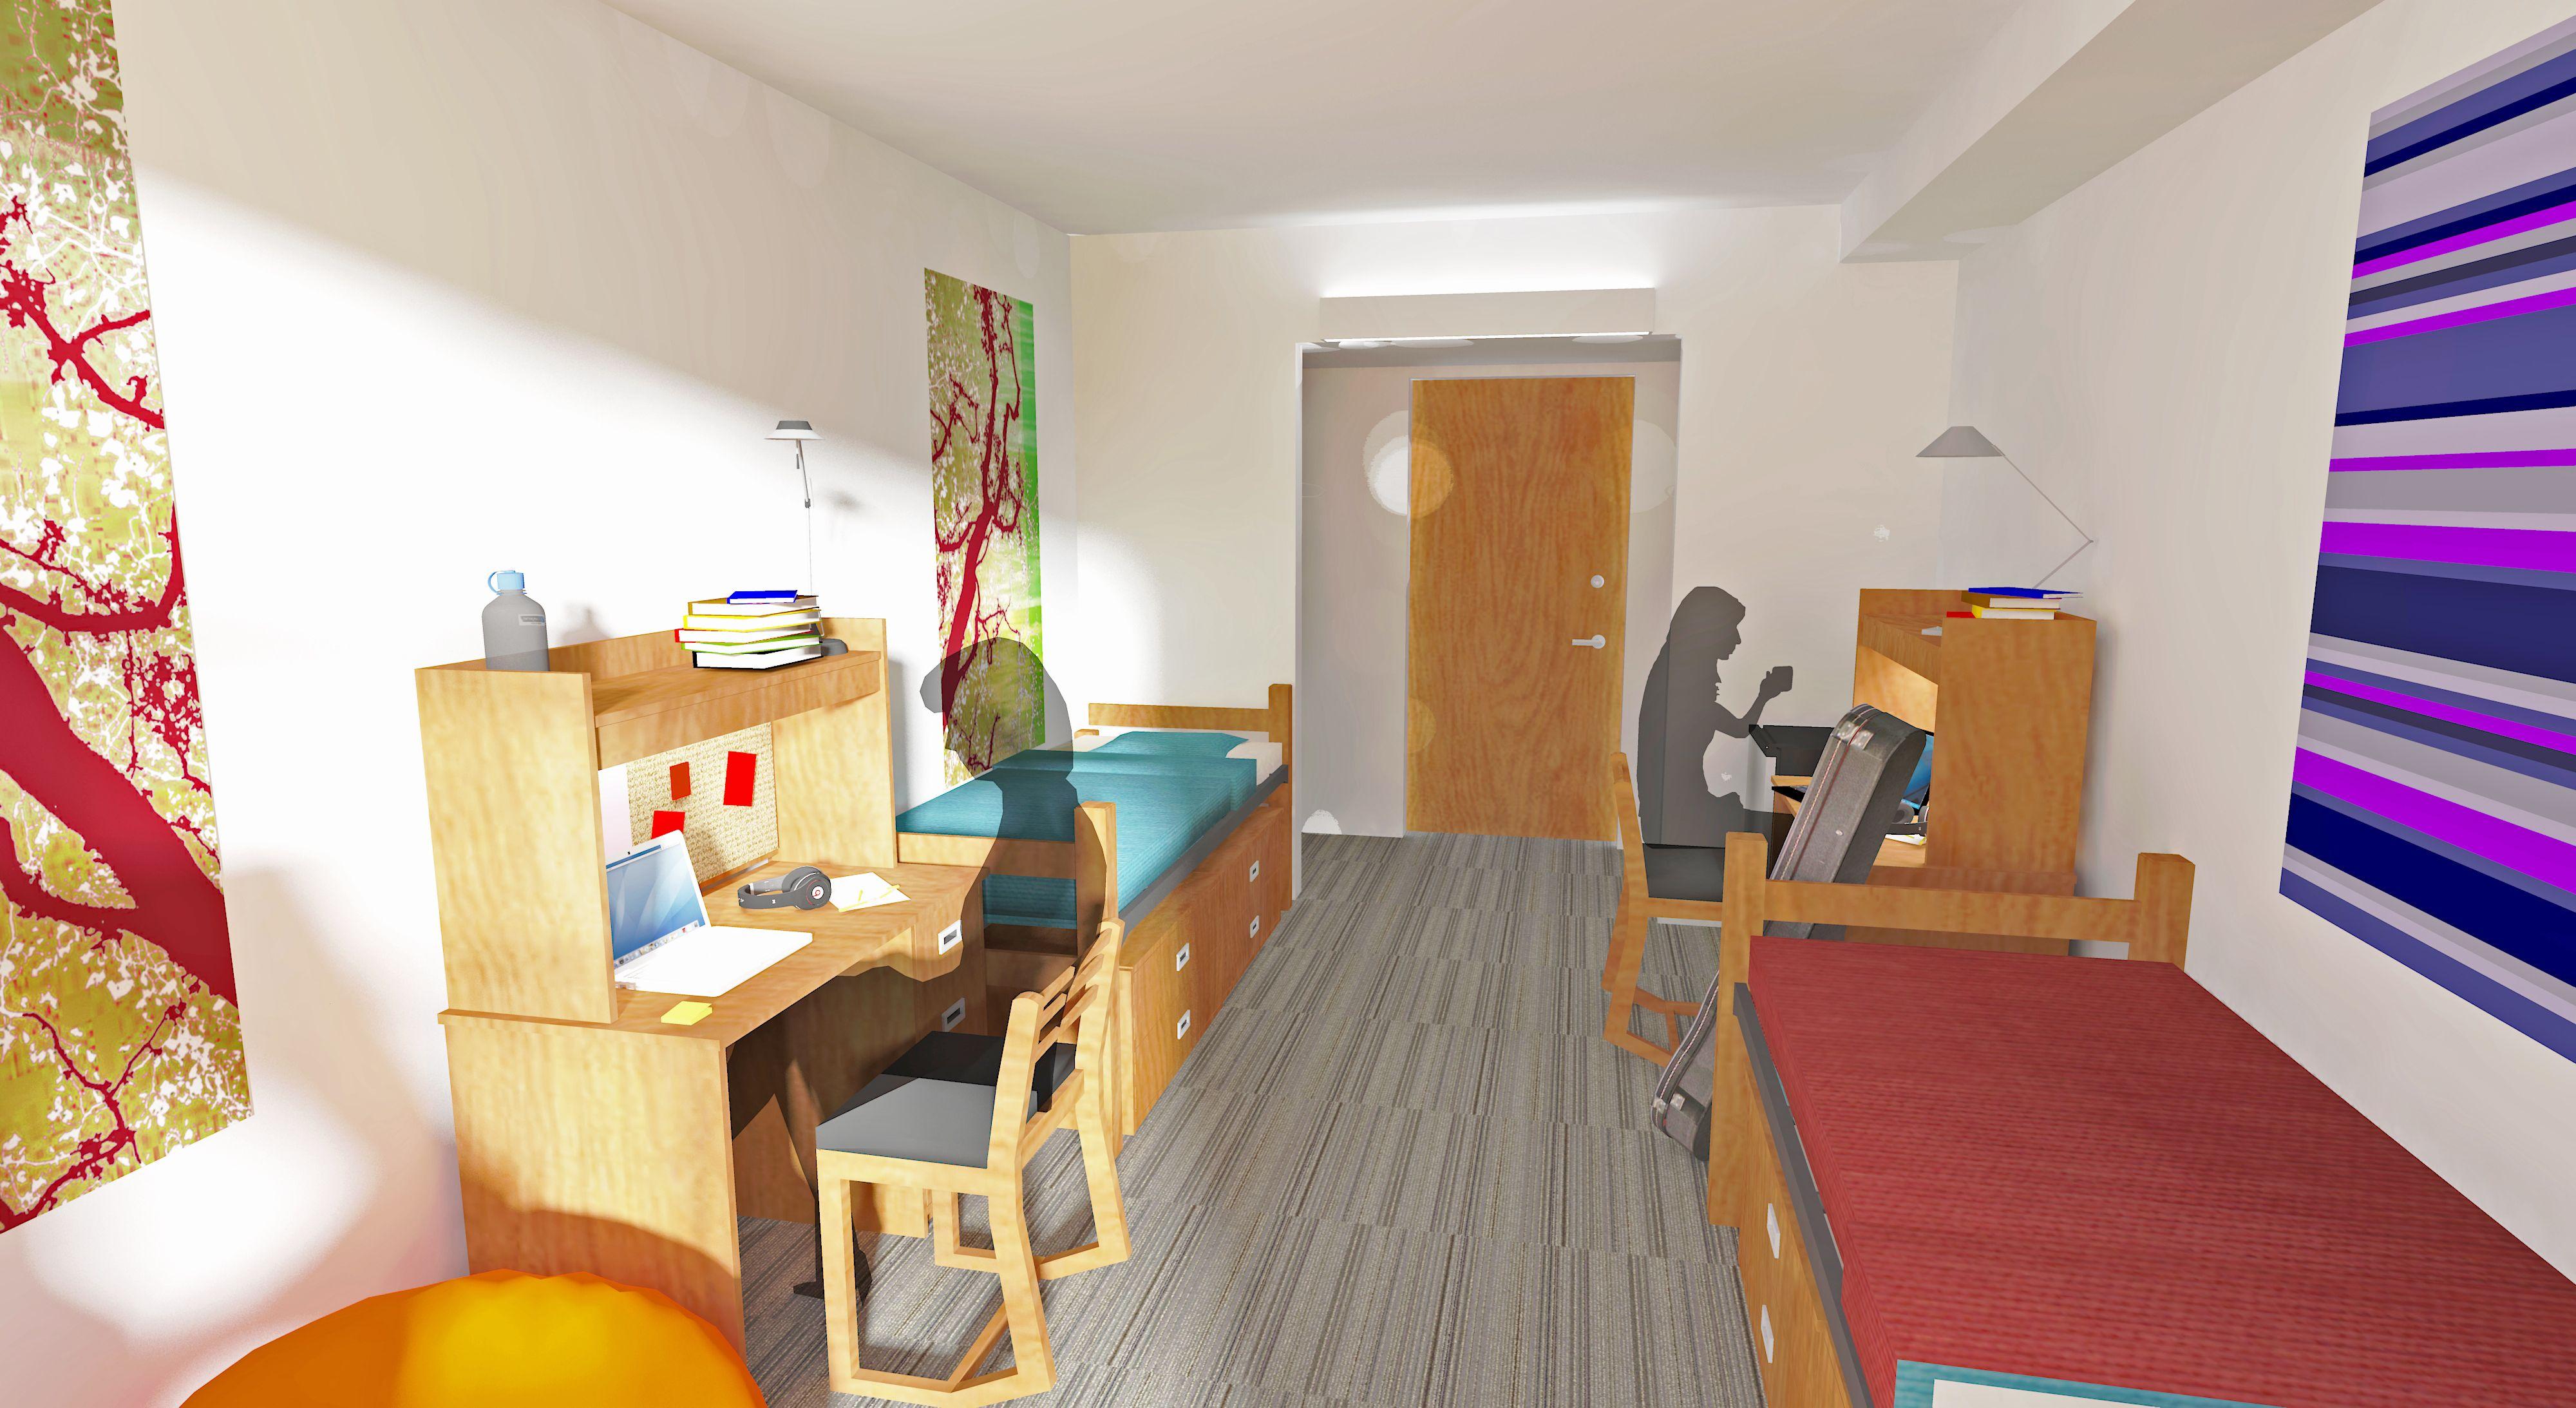 2013 02 08 Dorm Room Rendering ALT VIEW 4,000×2,186 Pixels Part 36